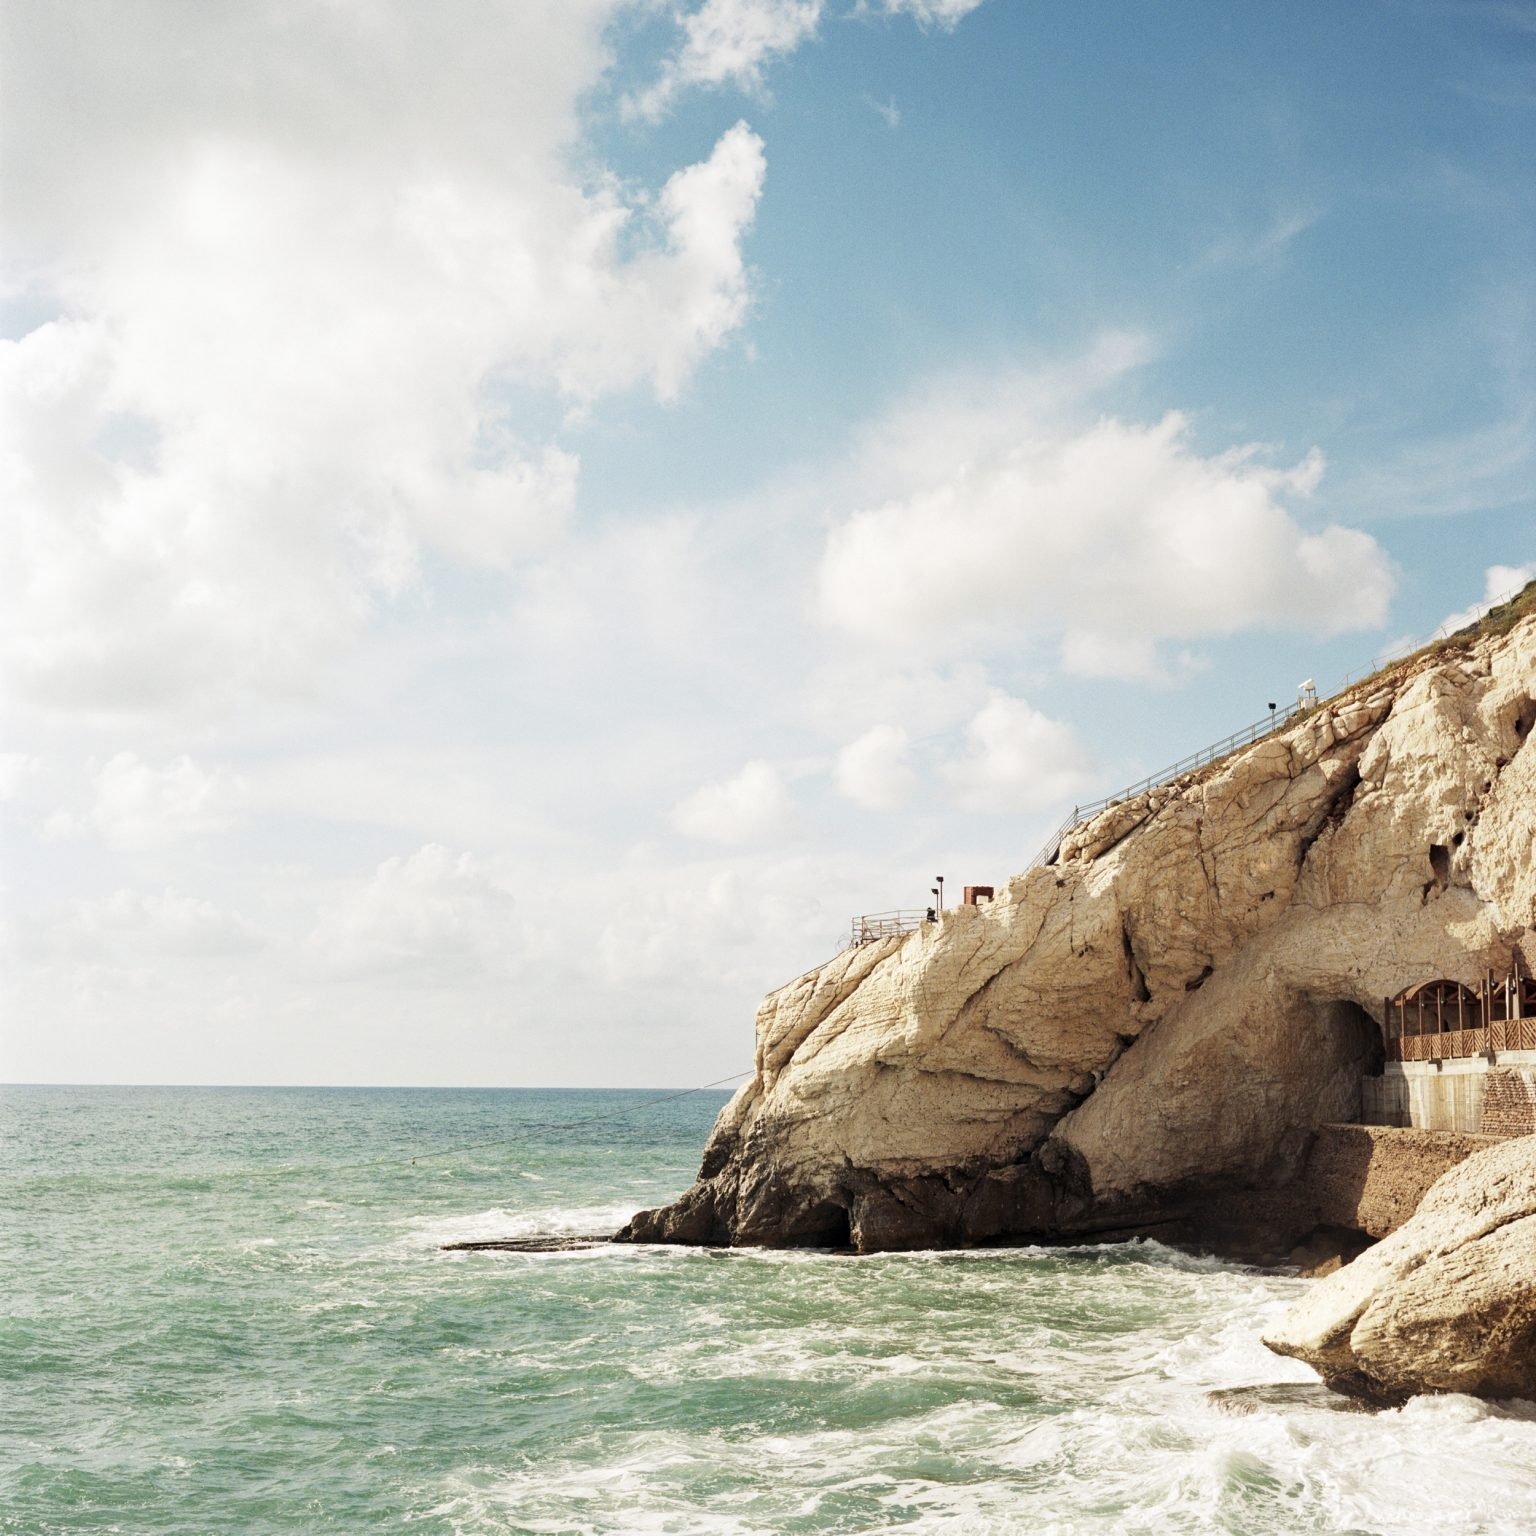 Rosh Hanikra, Israel. The Rosh Hanikra cape, the extreme point of Israeli territory on the sea before Lebanon.